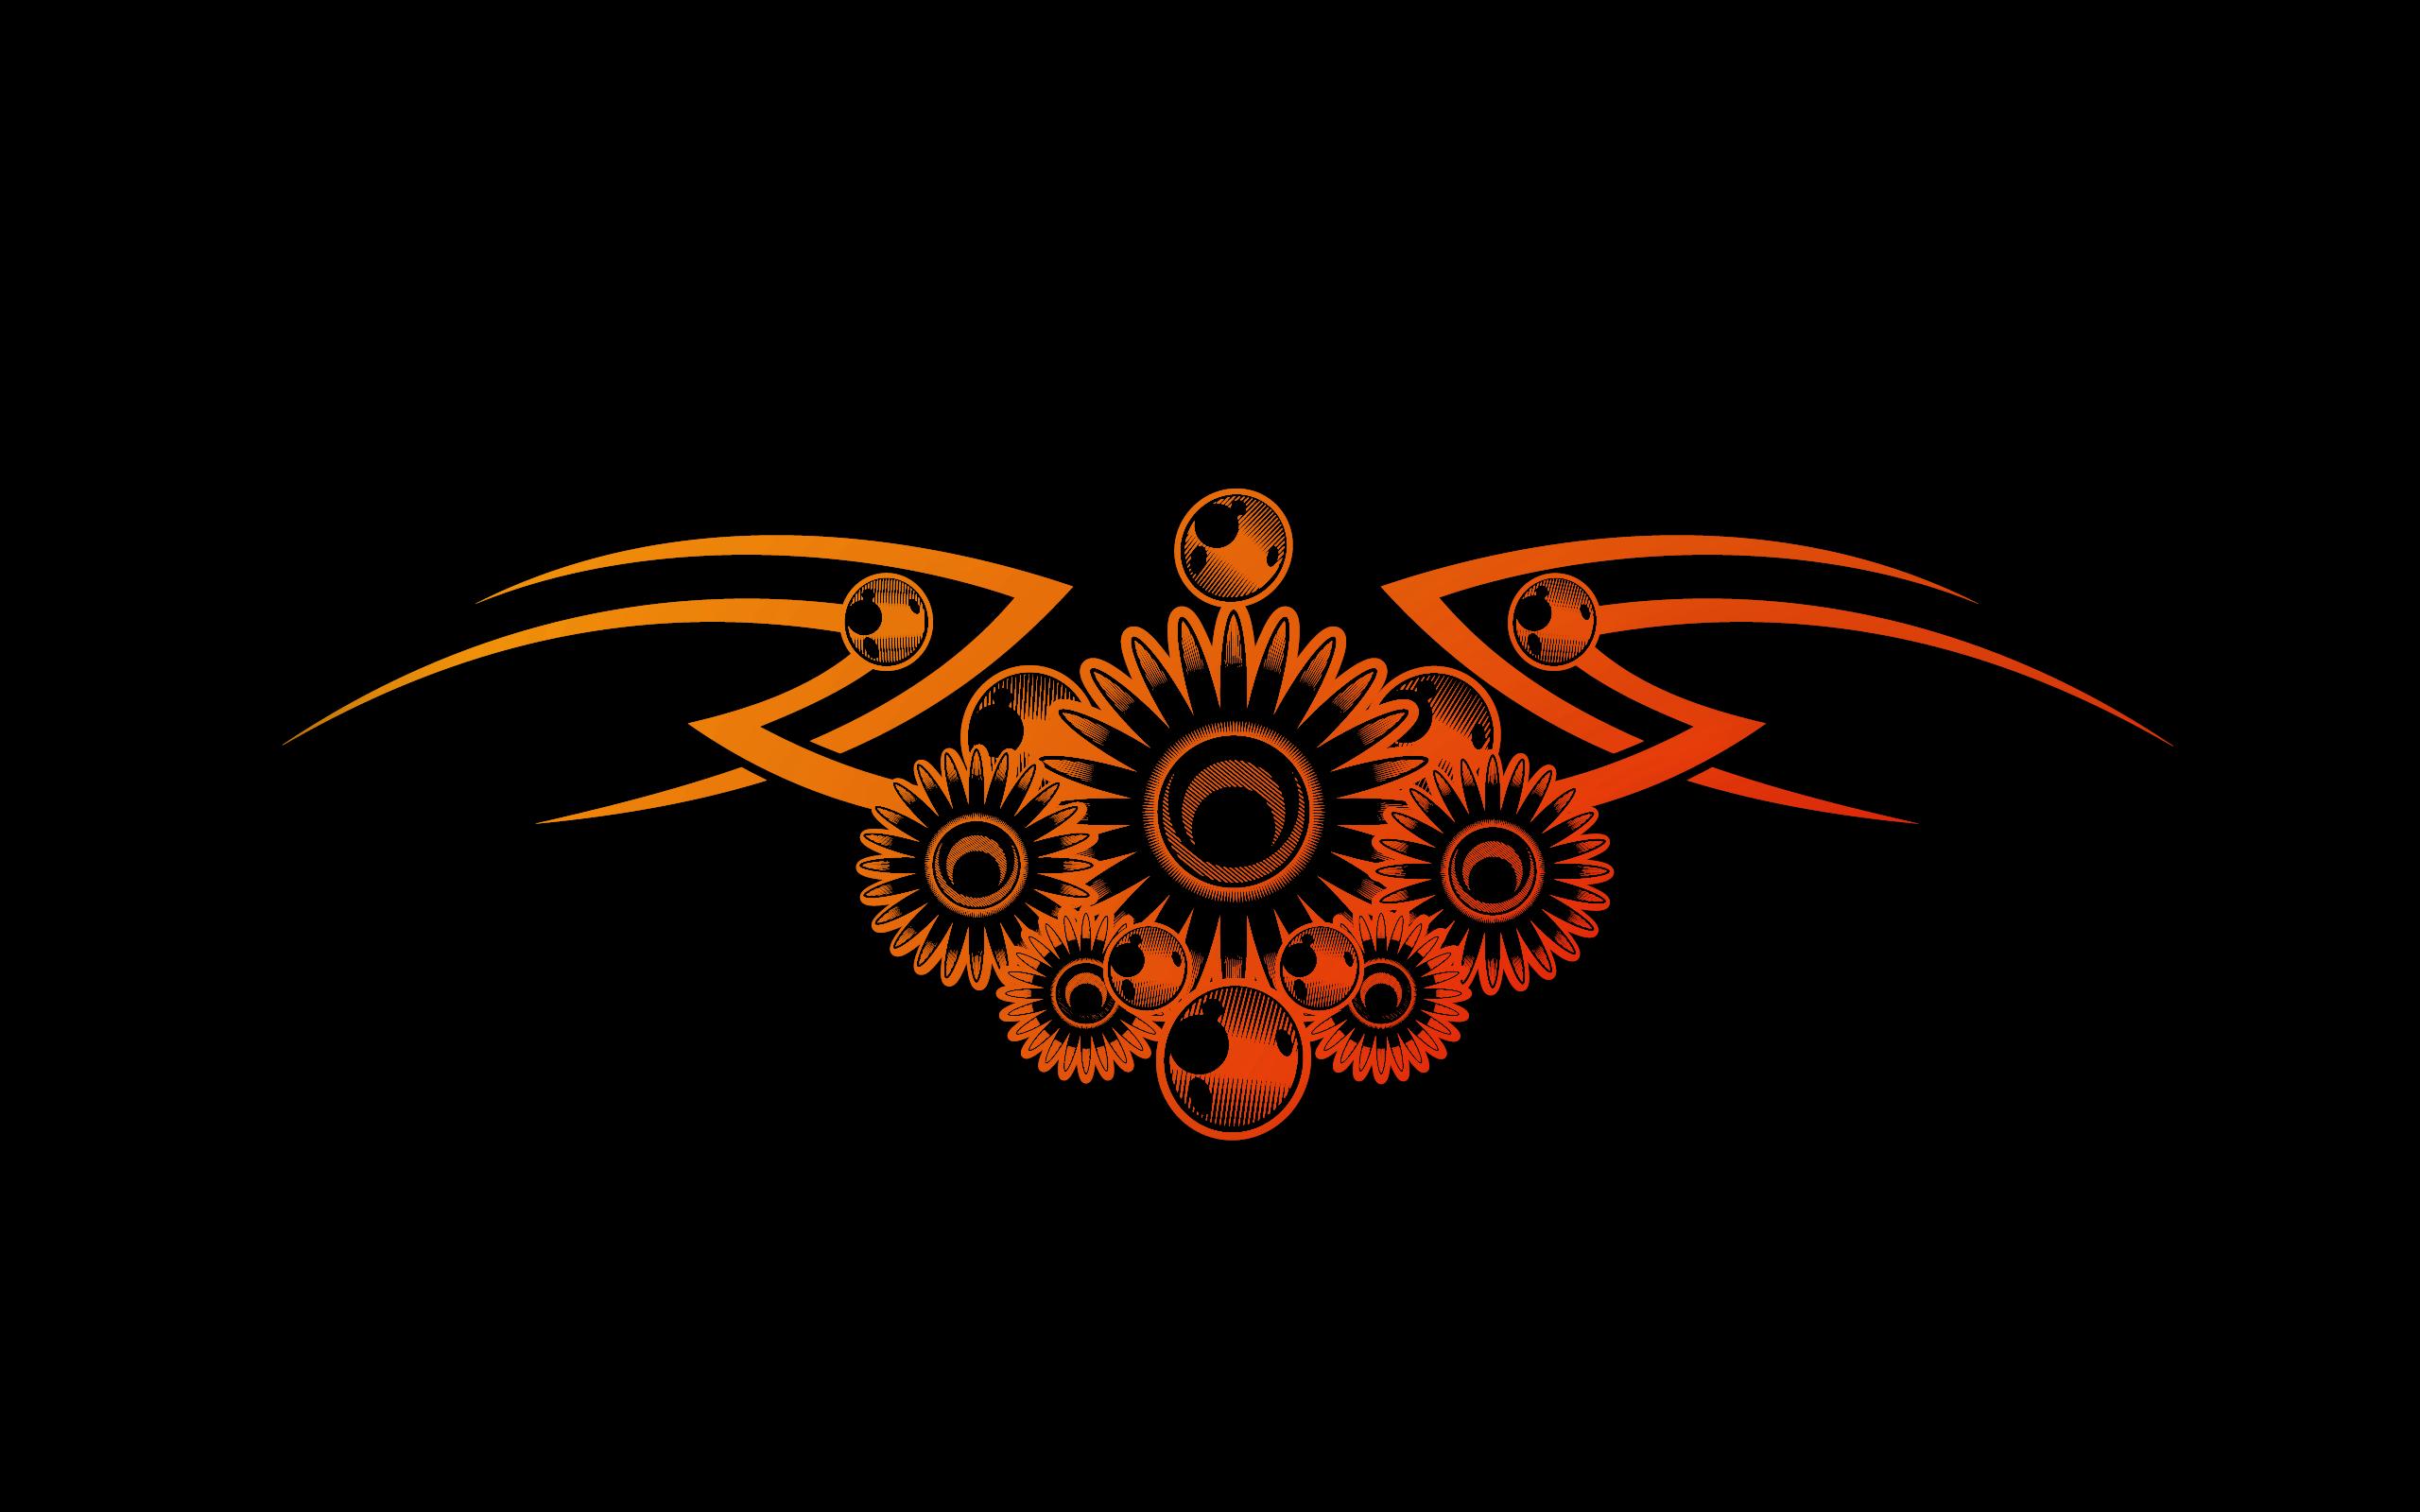 Pin Tribal Gear Wallpaper Desktop Background Lilzeu Tattoo De on 2560x1600